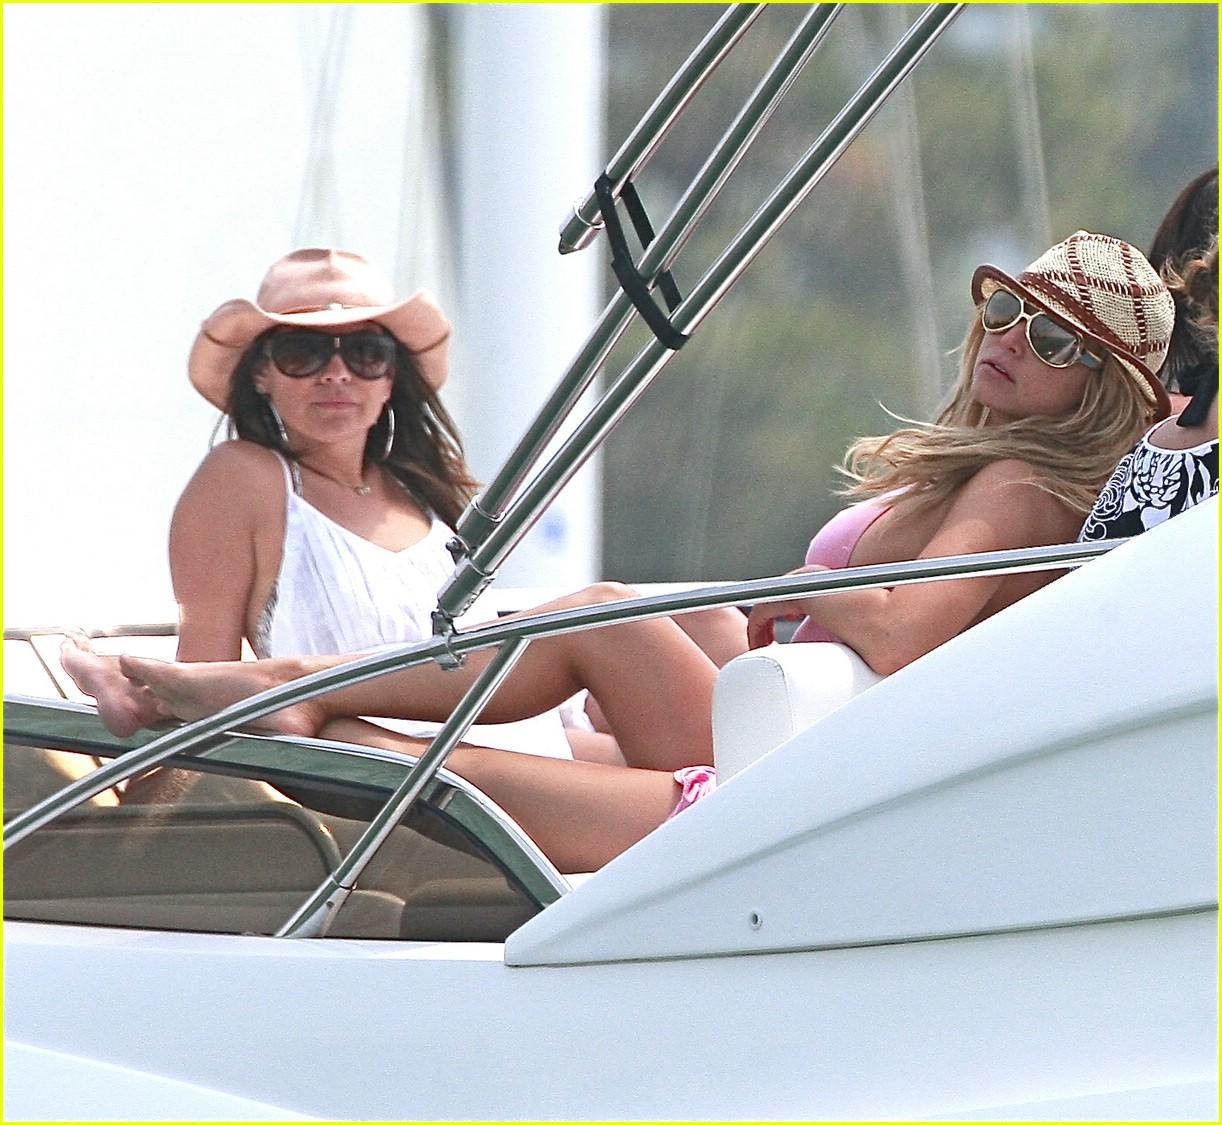 jessica simpson ashlee simpson yacht 01